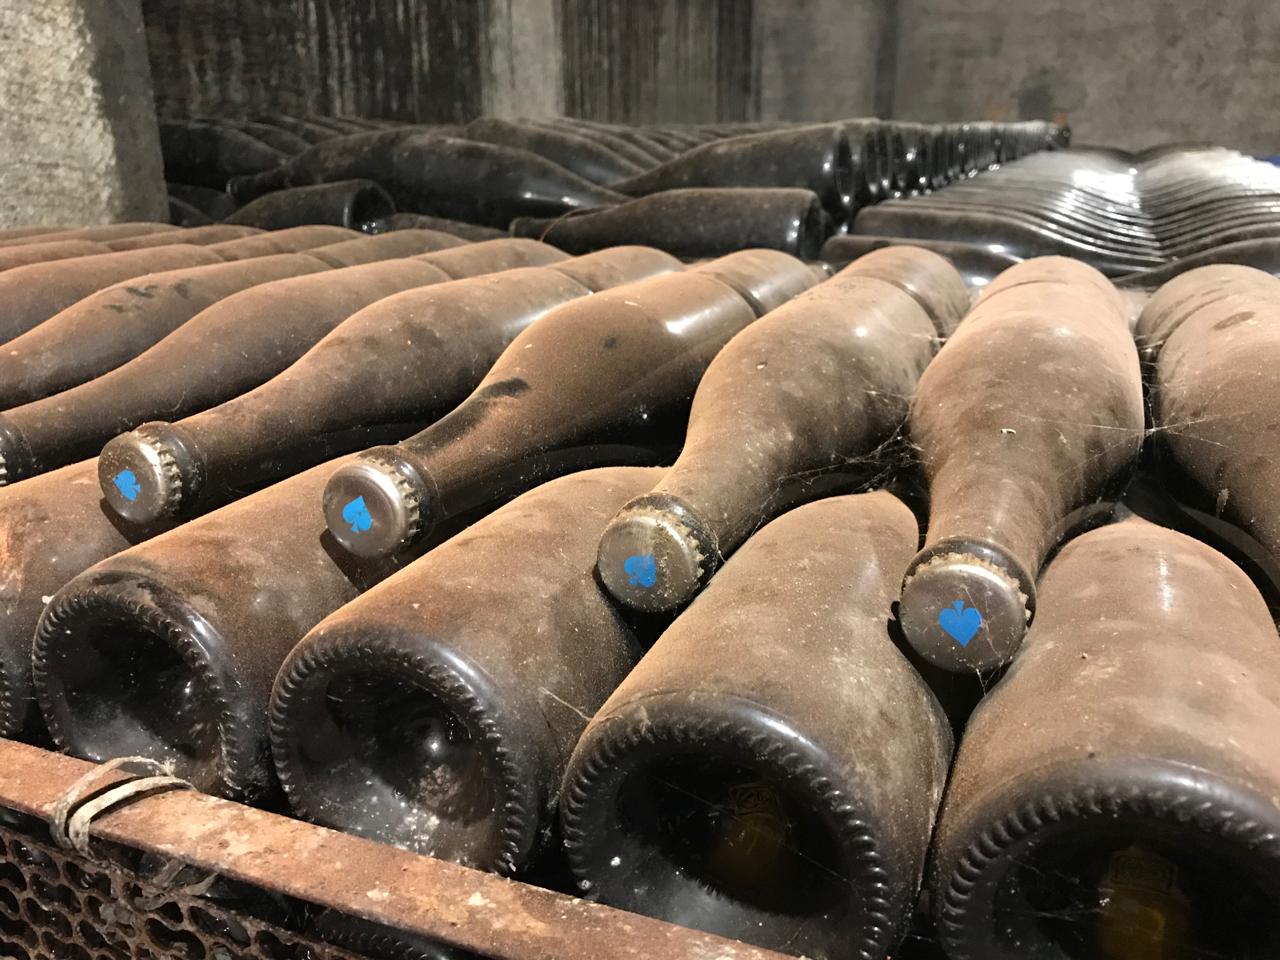 Sparkling wine undergoing bottle fermentation at Grover Zampa.